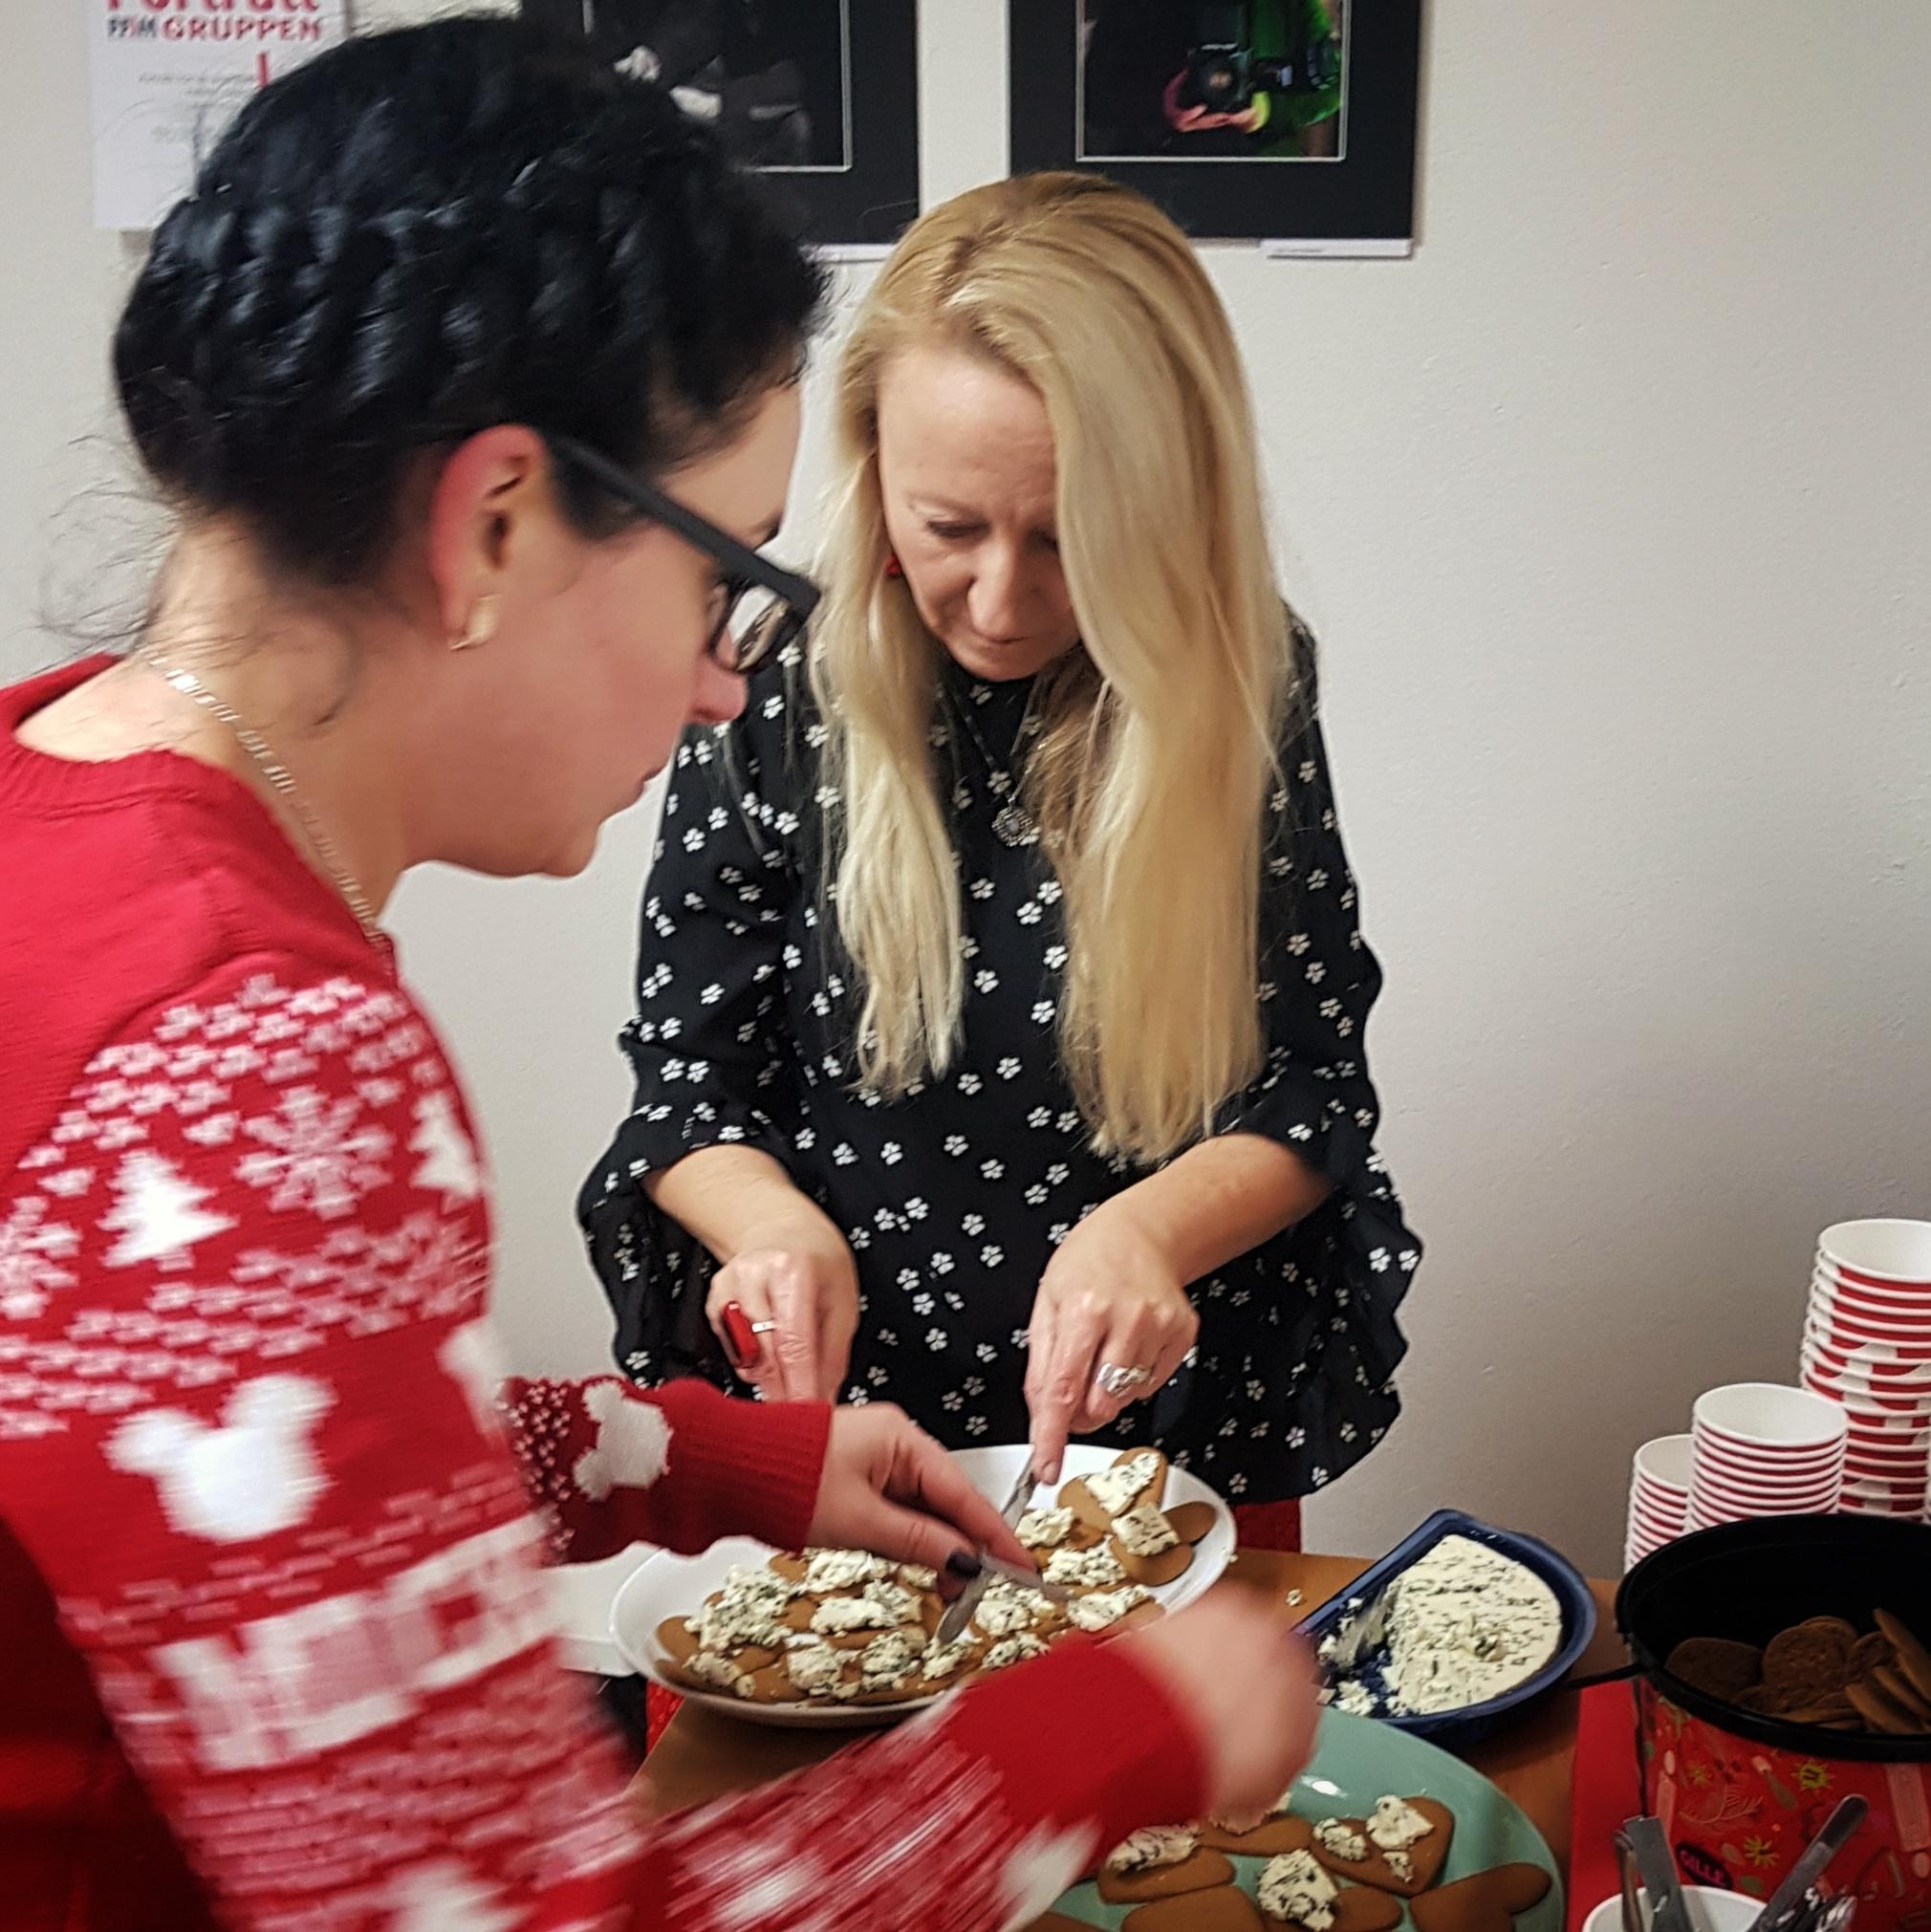 Day 351 - December 17: Preparing Christmas treats